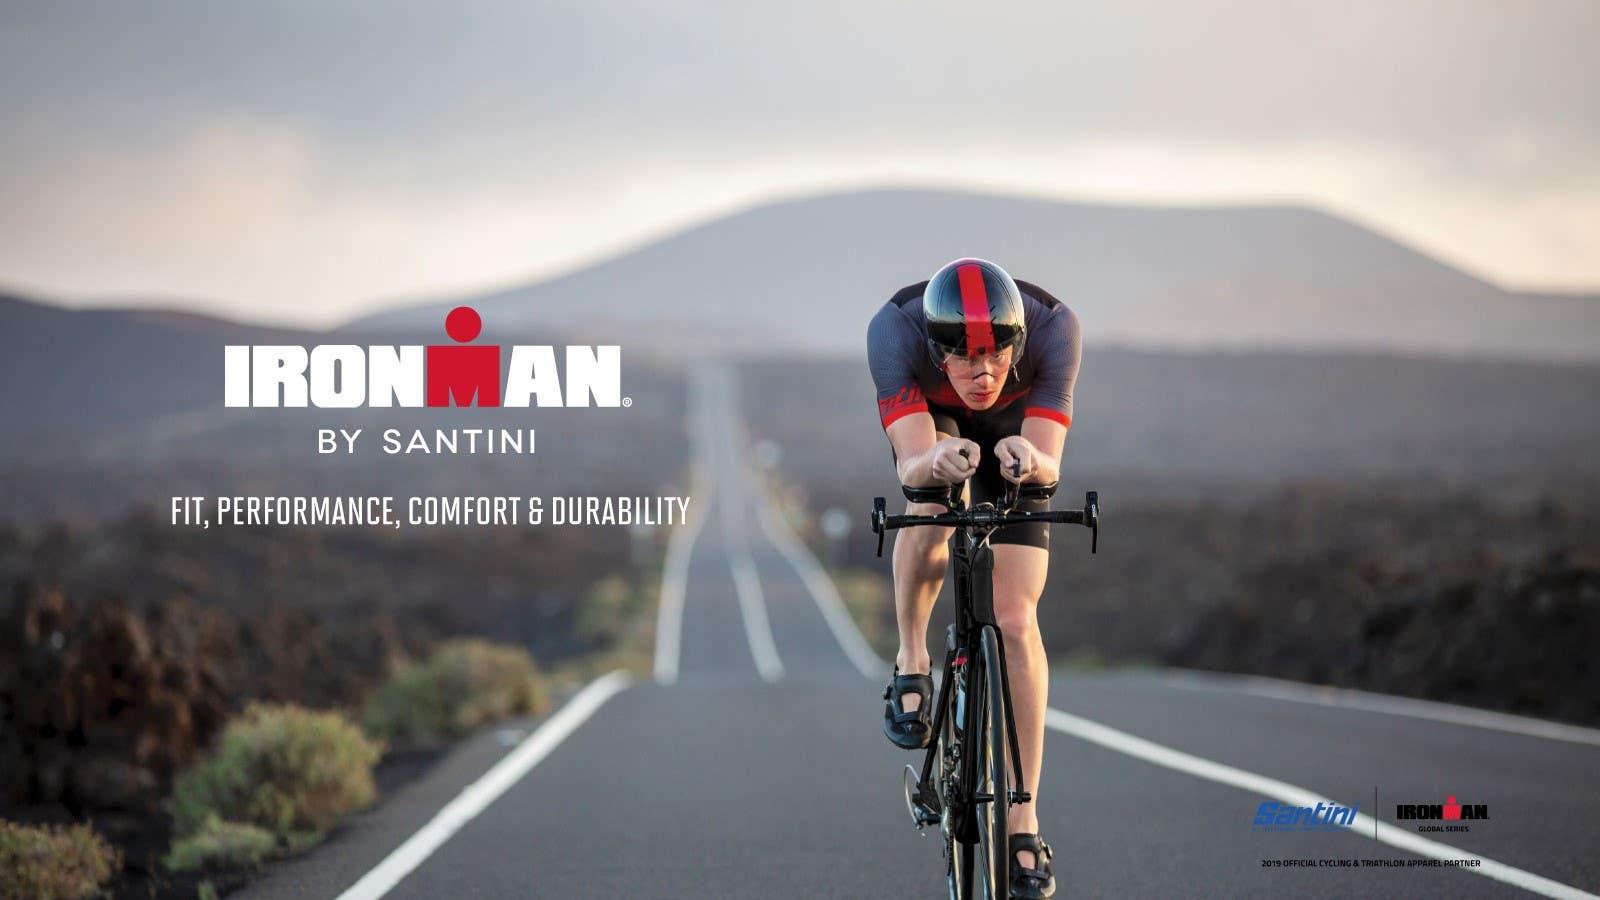 IRONMAN BY SANTINI